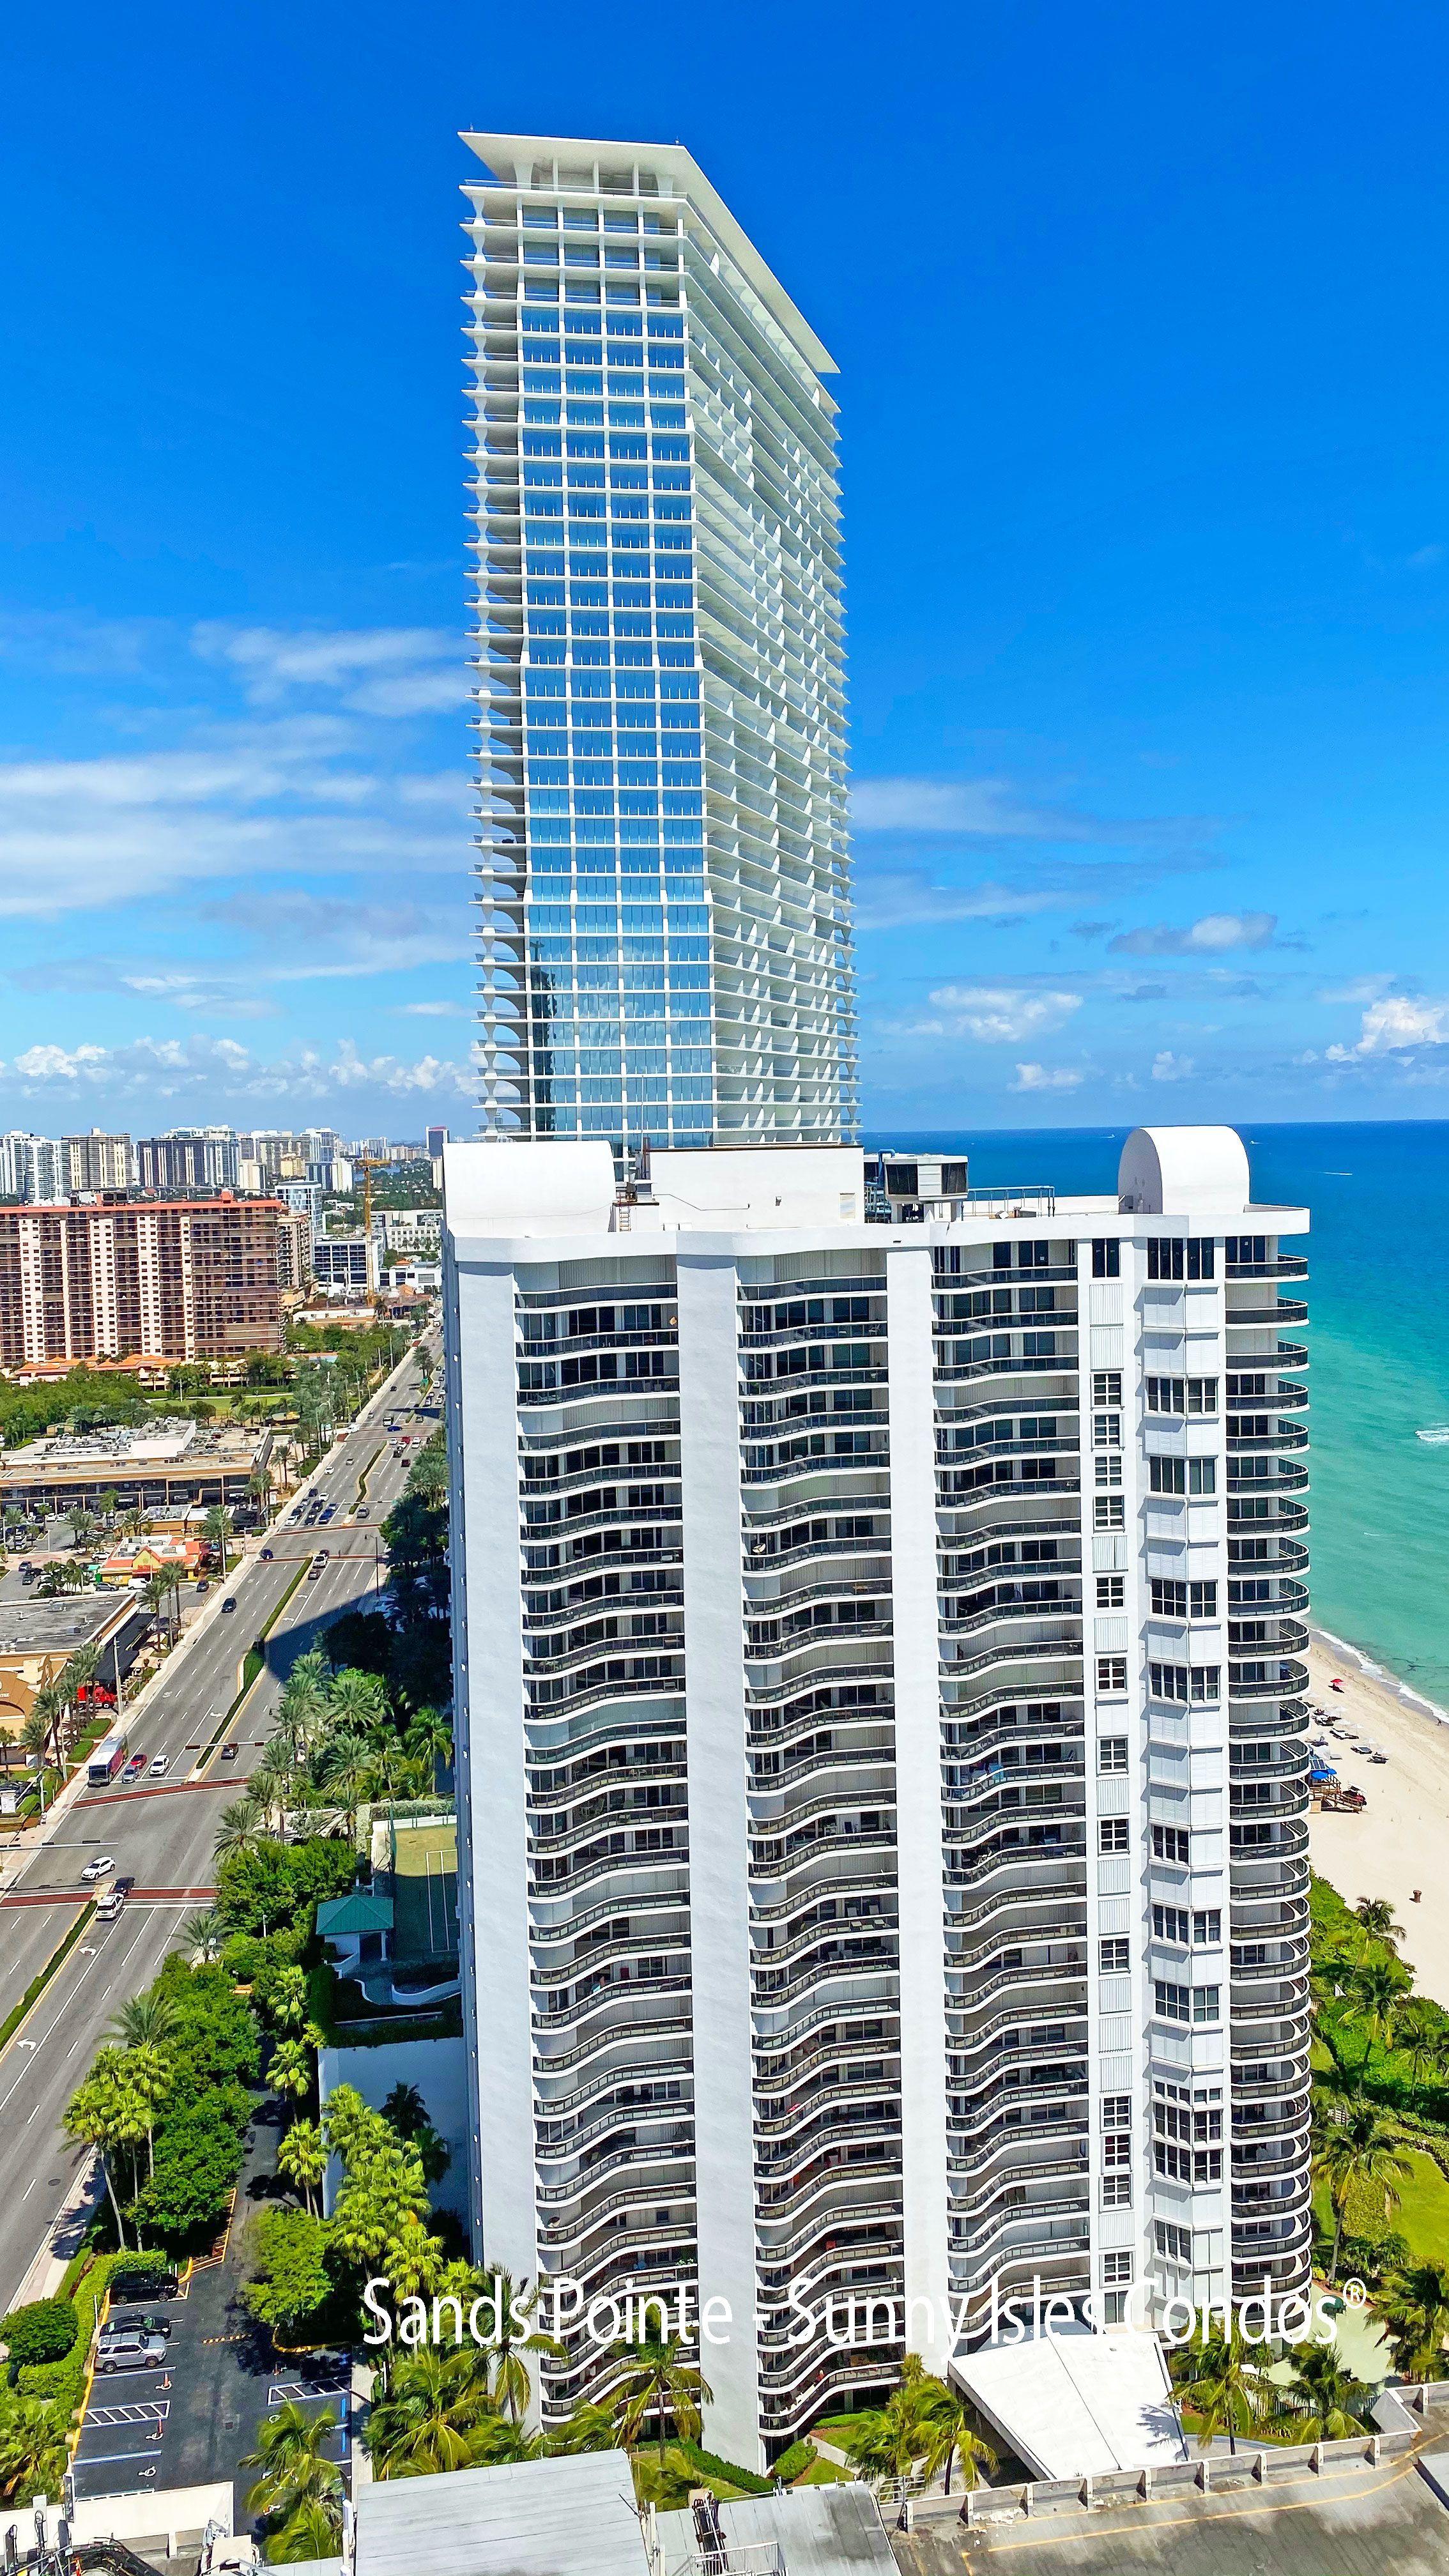 Sands Pointe Oceanfront Condos For Sale Sunny Isles Beach Miami Beach Buildings Sunny Isles